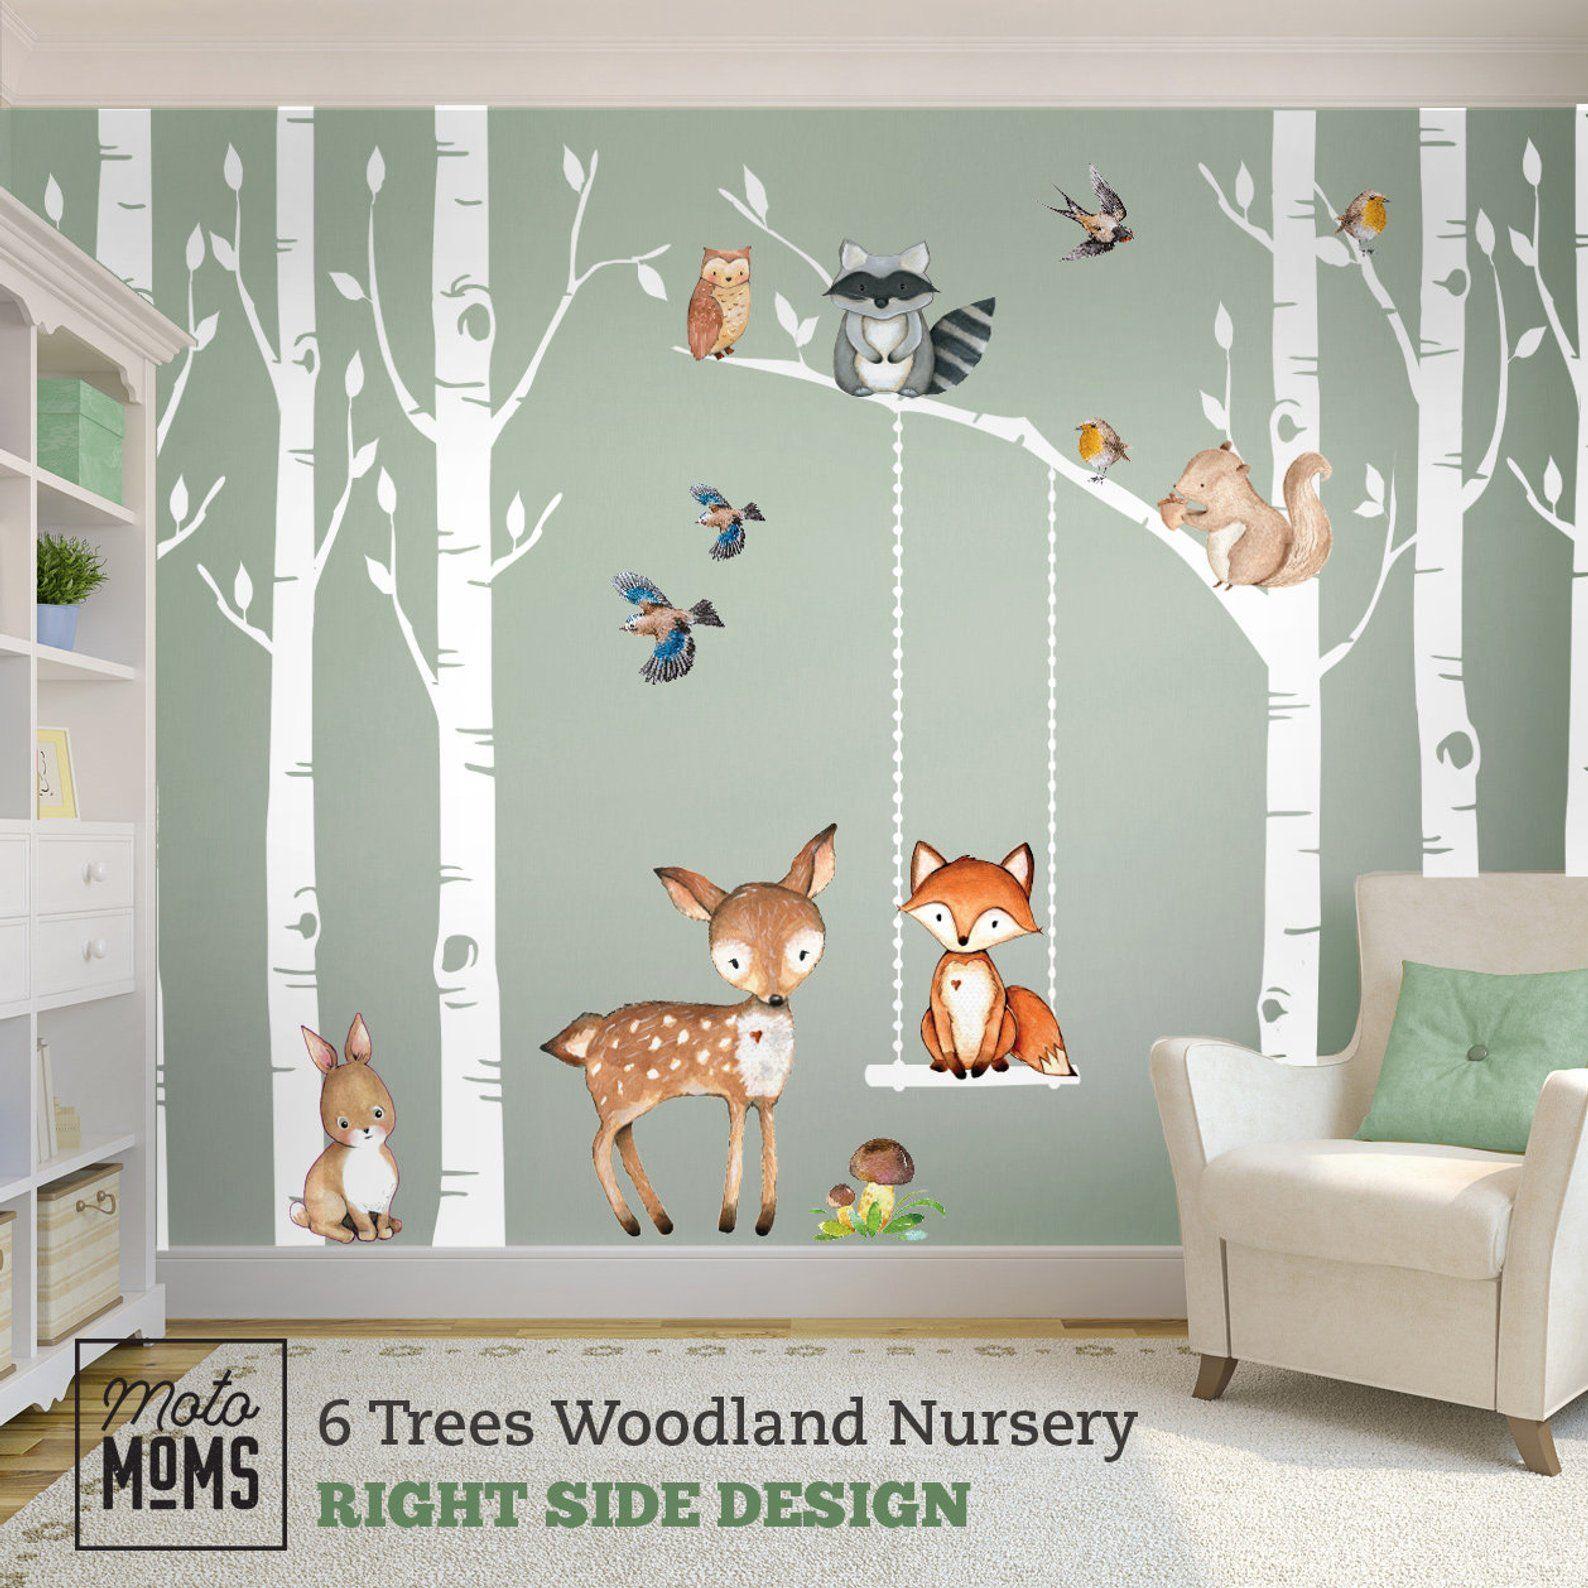 Nursery Wall Decal Forest Woodland Animals Critters Squirrel Children Room Decor